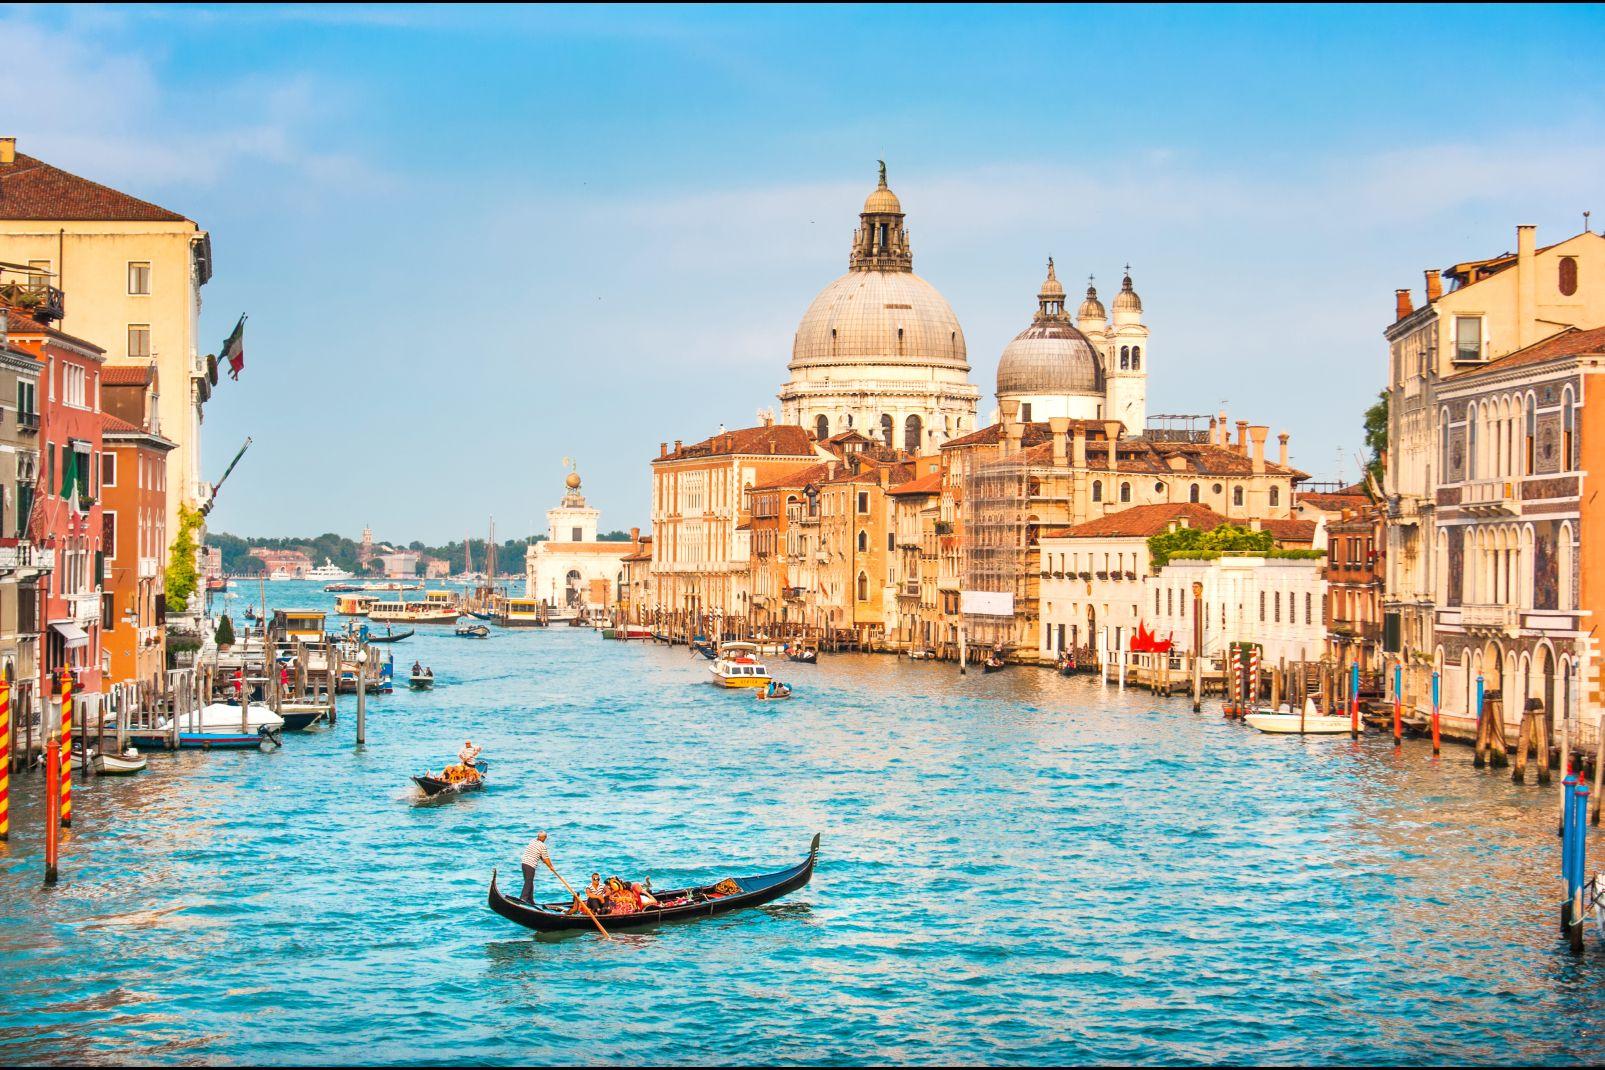 Vénétie, Italie